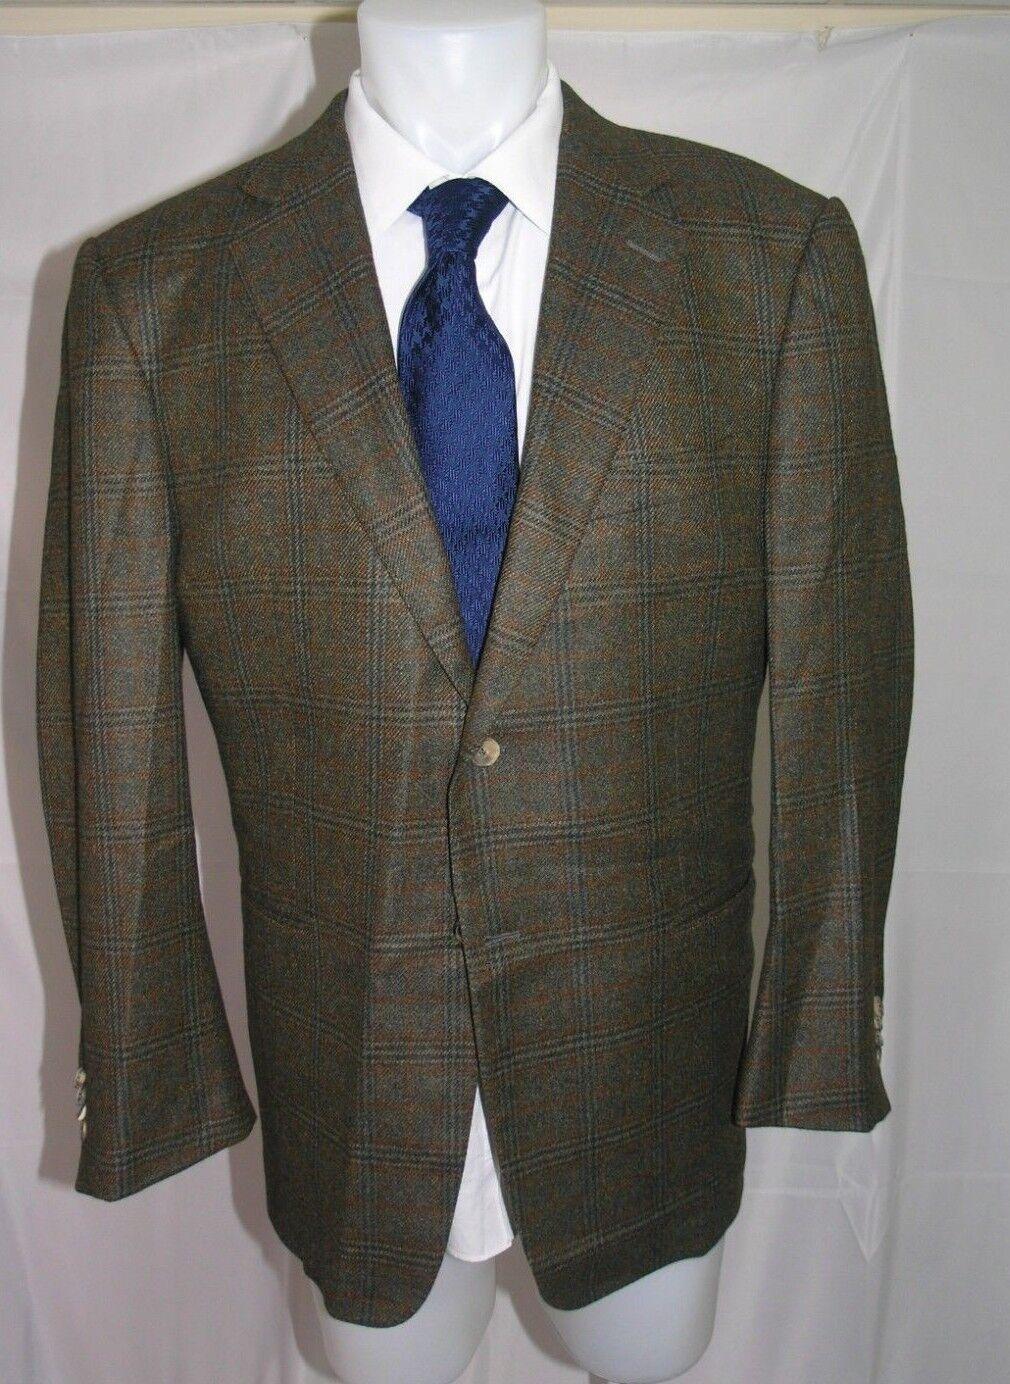 Ermänneregildo Zegna Su Misura Two Button Plaid Pure Cashmere Blazer 44 R